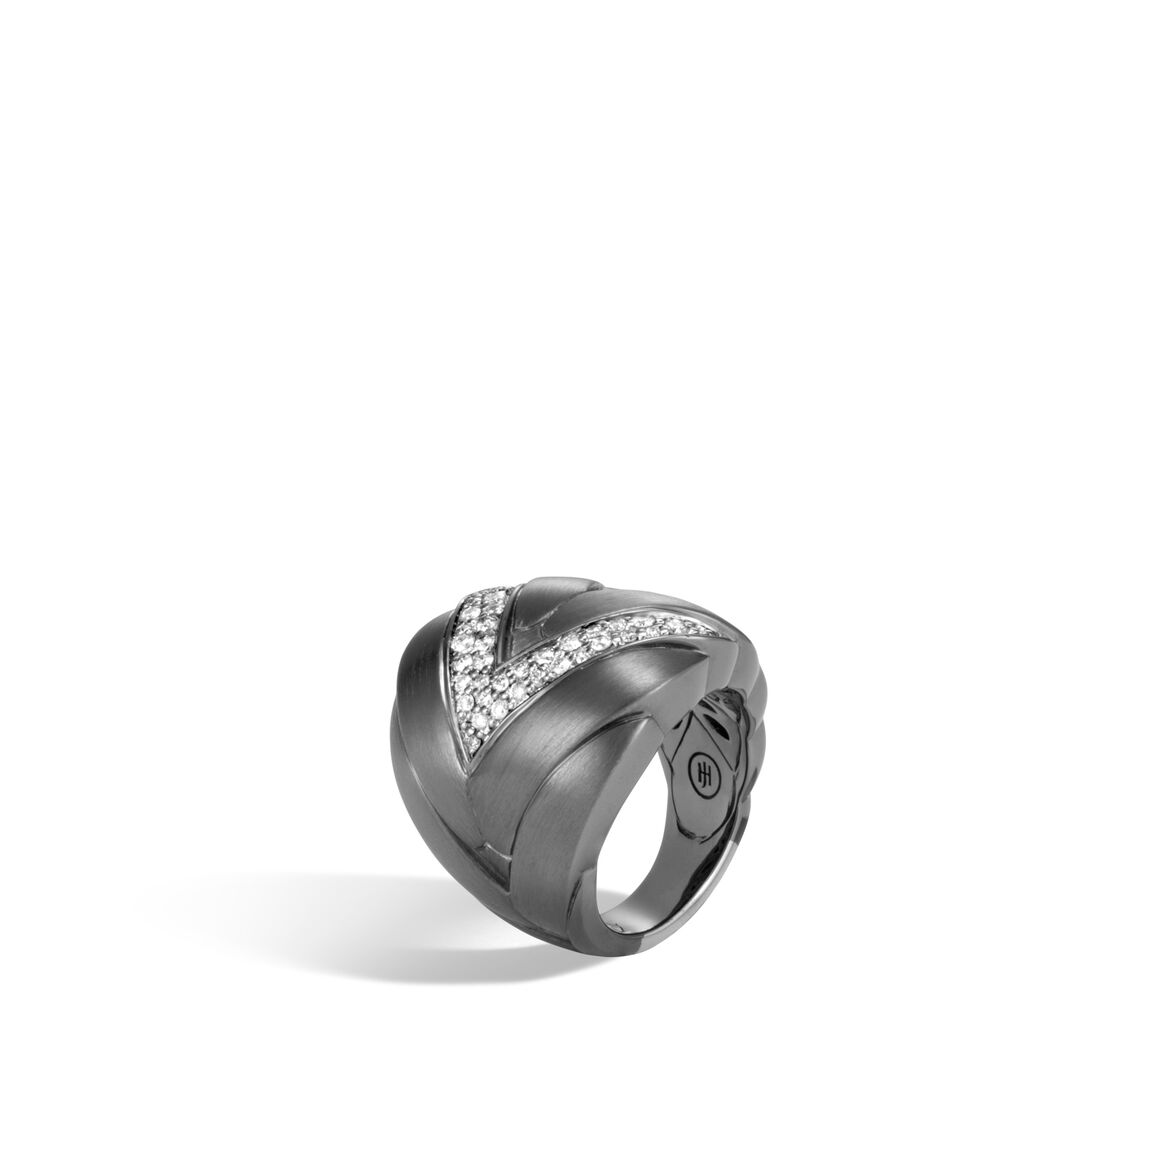 Modern Chain 24MM Ring in Blackened Silver, Diamonds